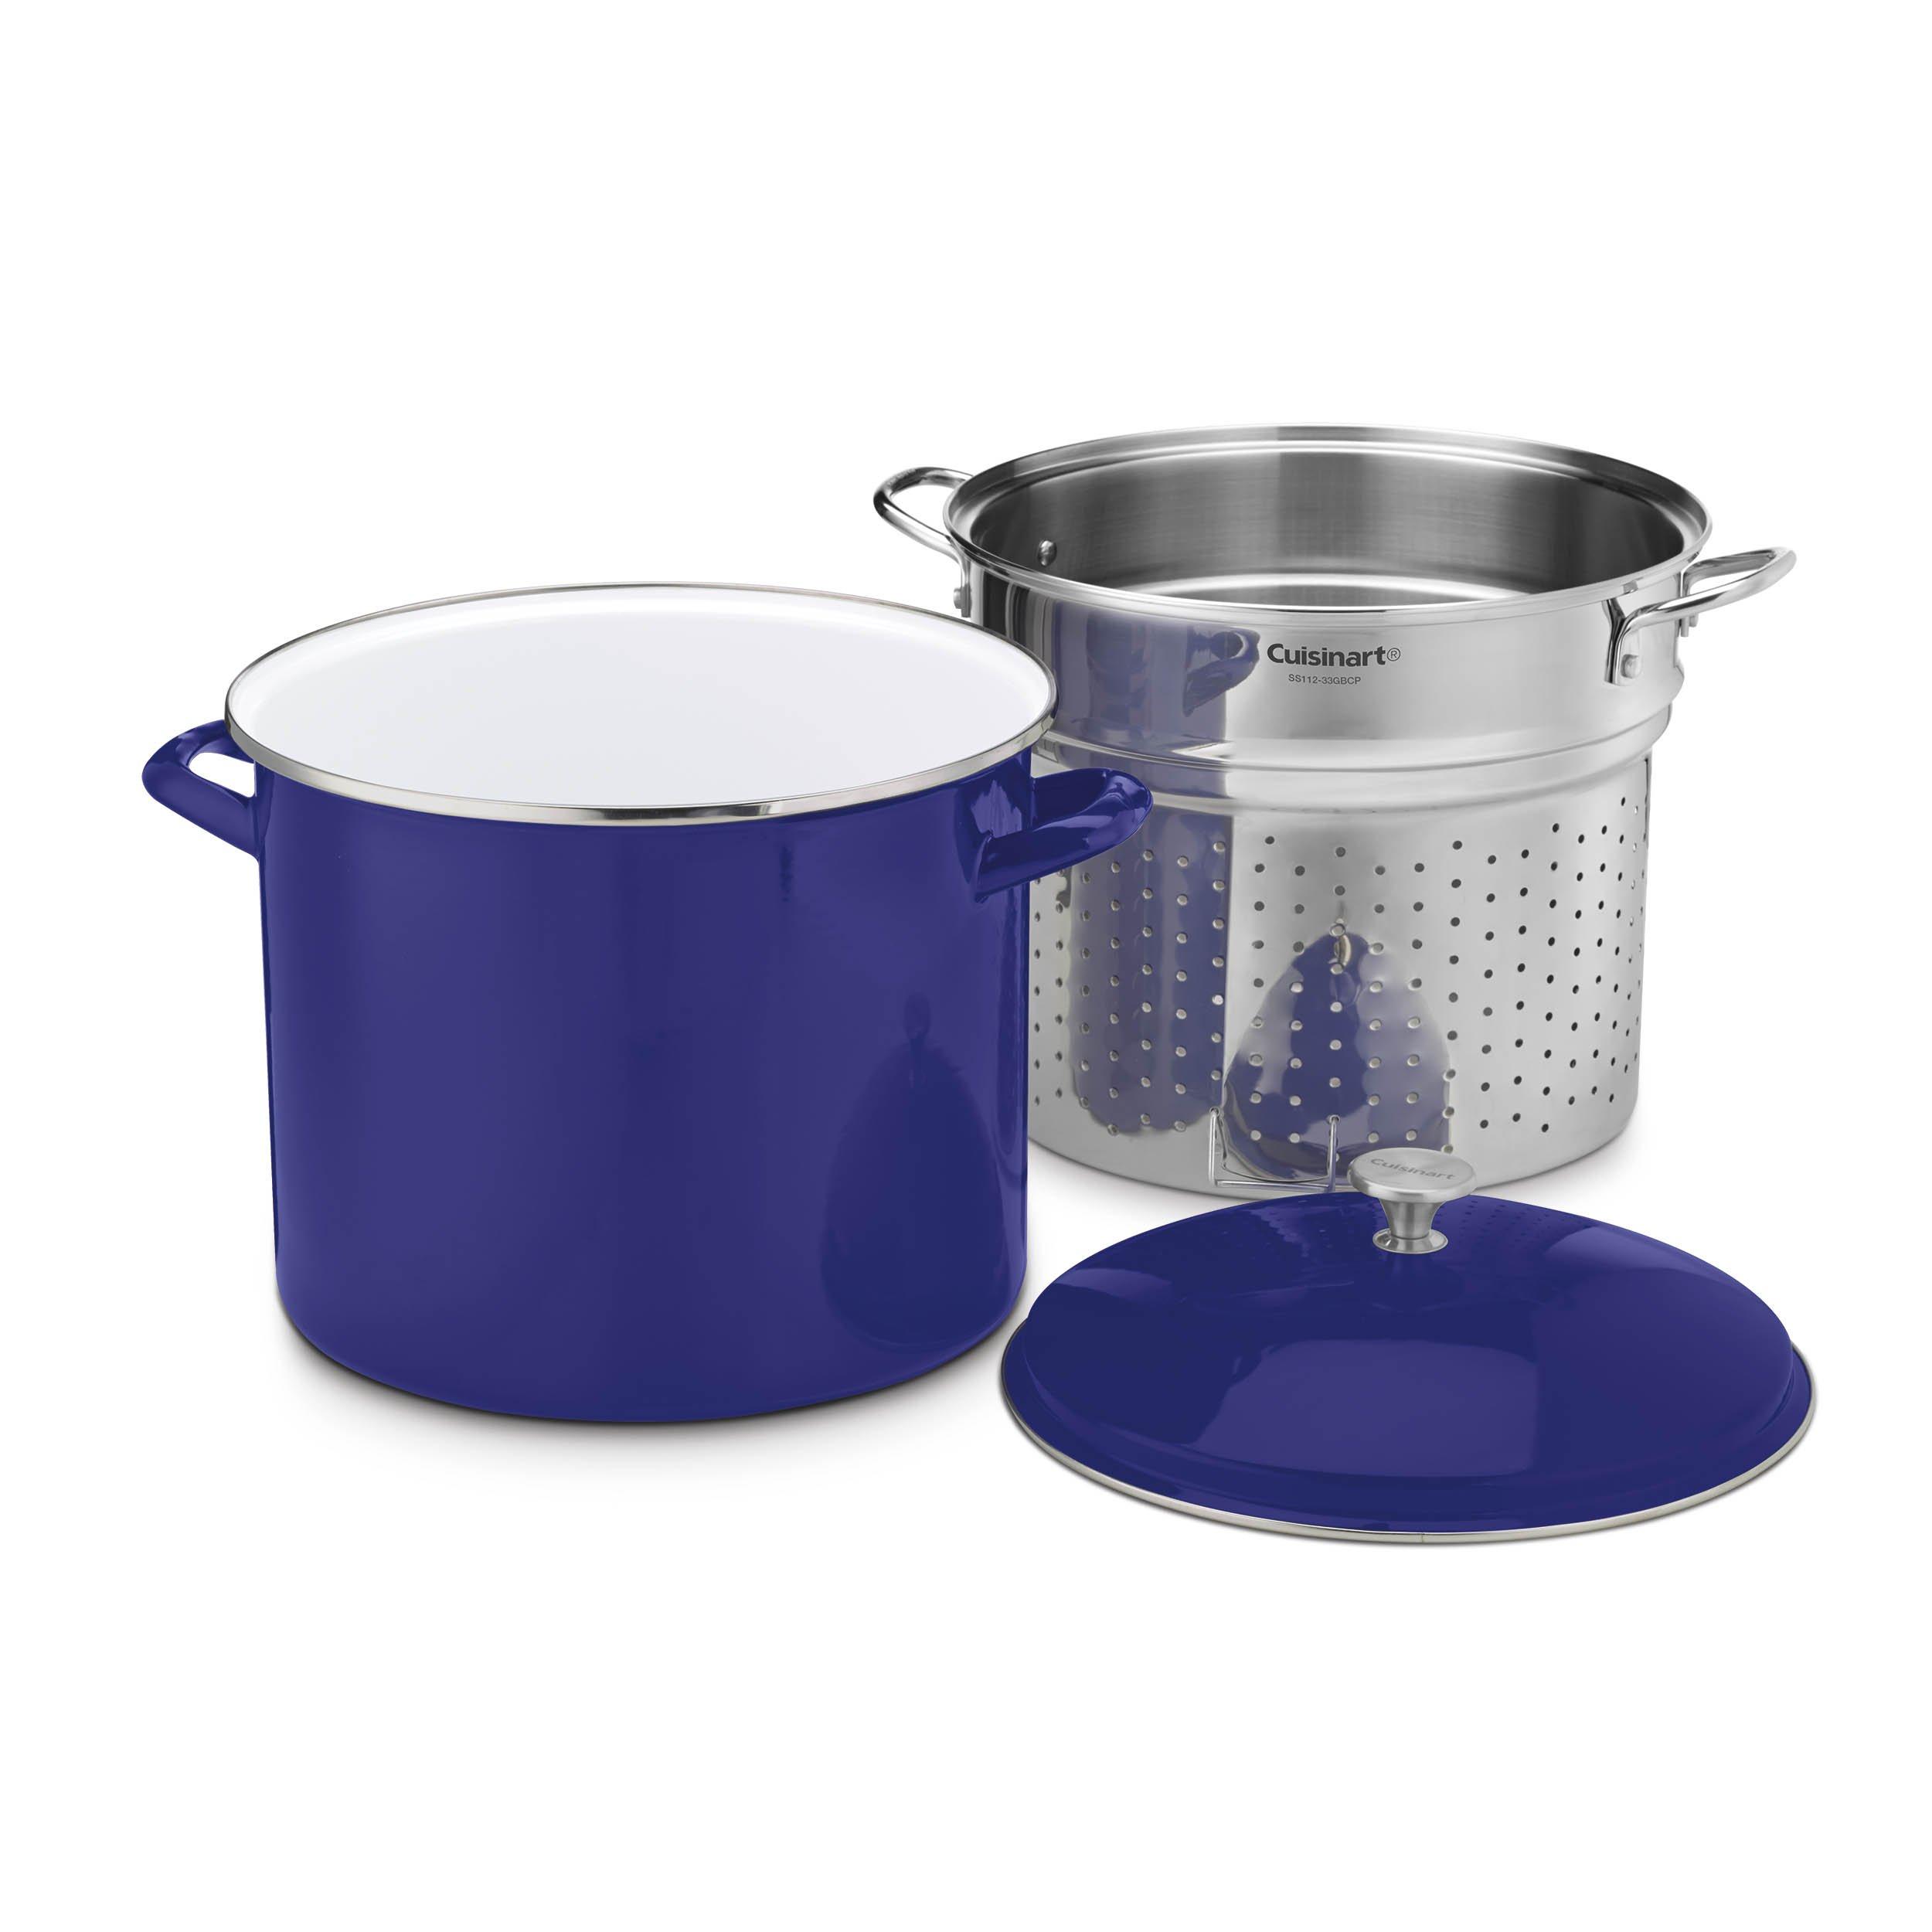 Cuisinart EOS206-33CBLSCP 3 Piece Stockpot/Steaming Set with Self-Draining Clip, 20 quart, Cobalt Blue